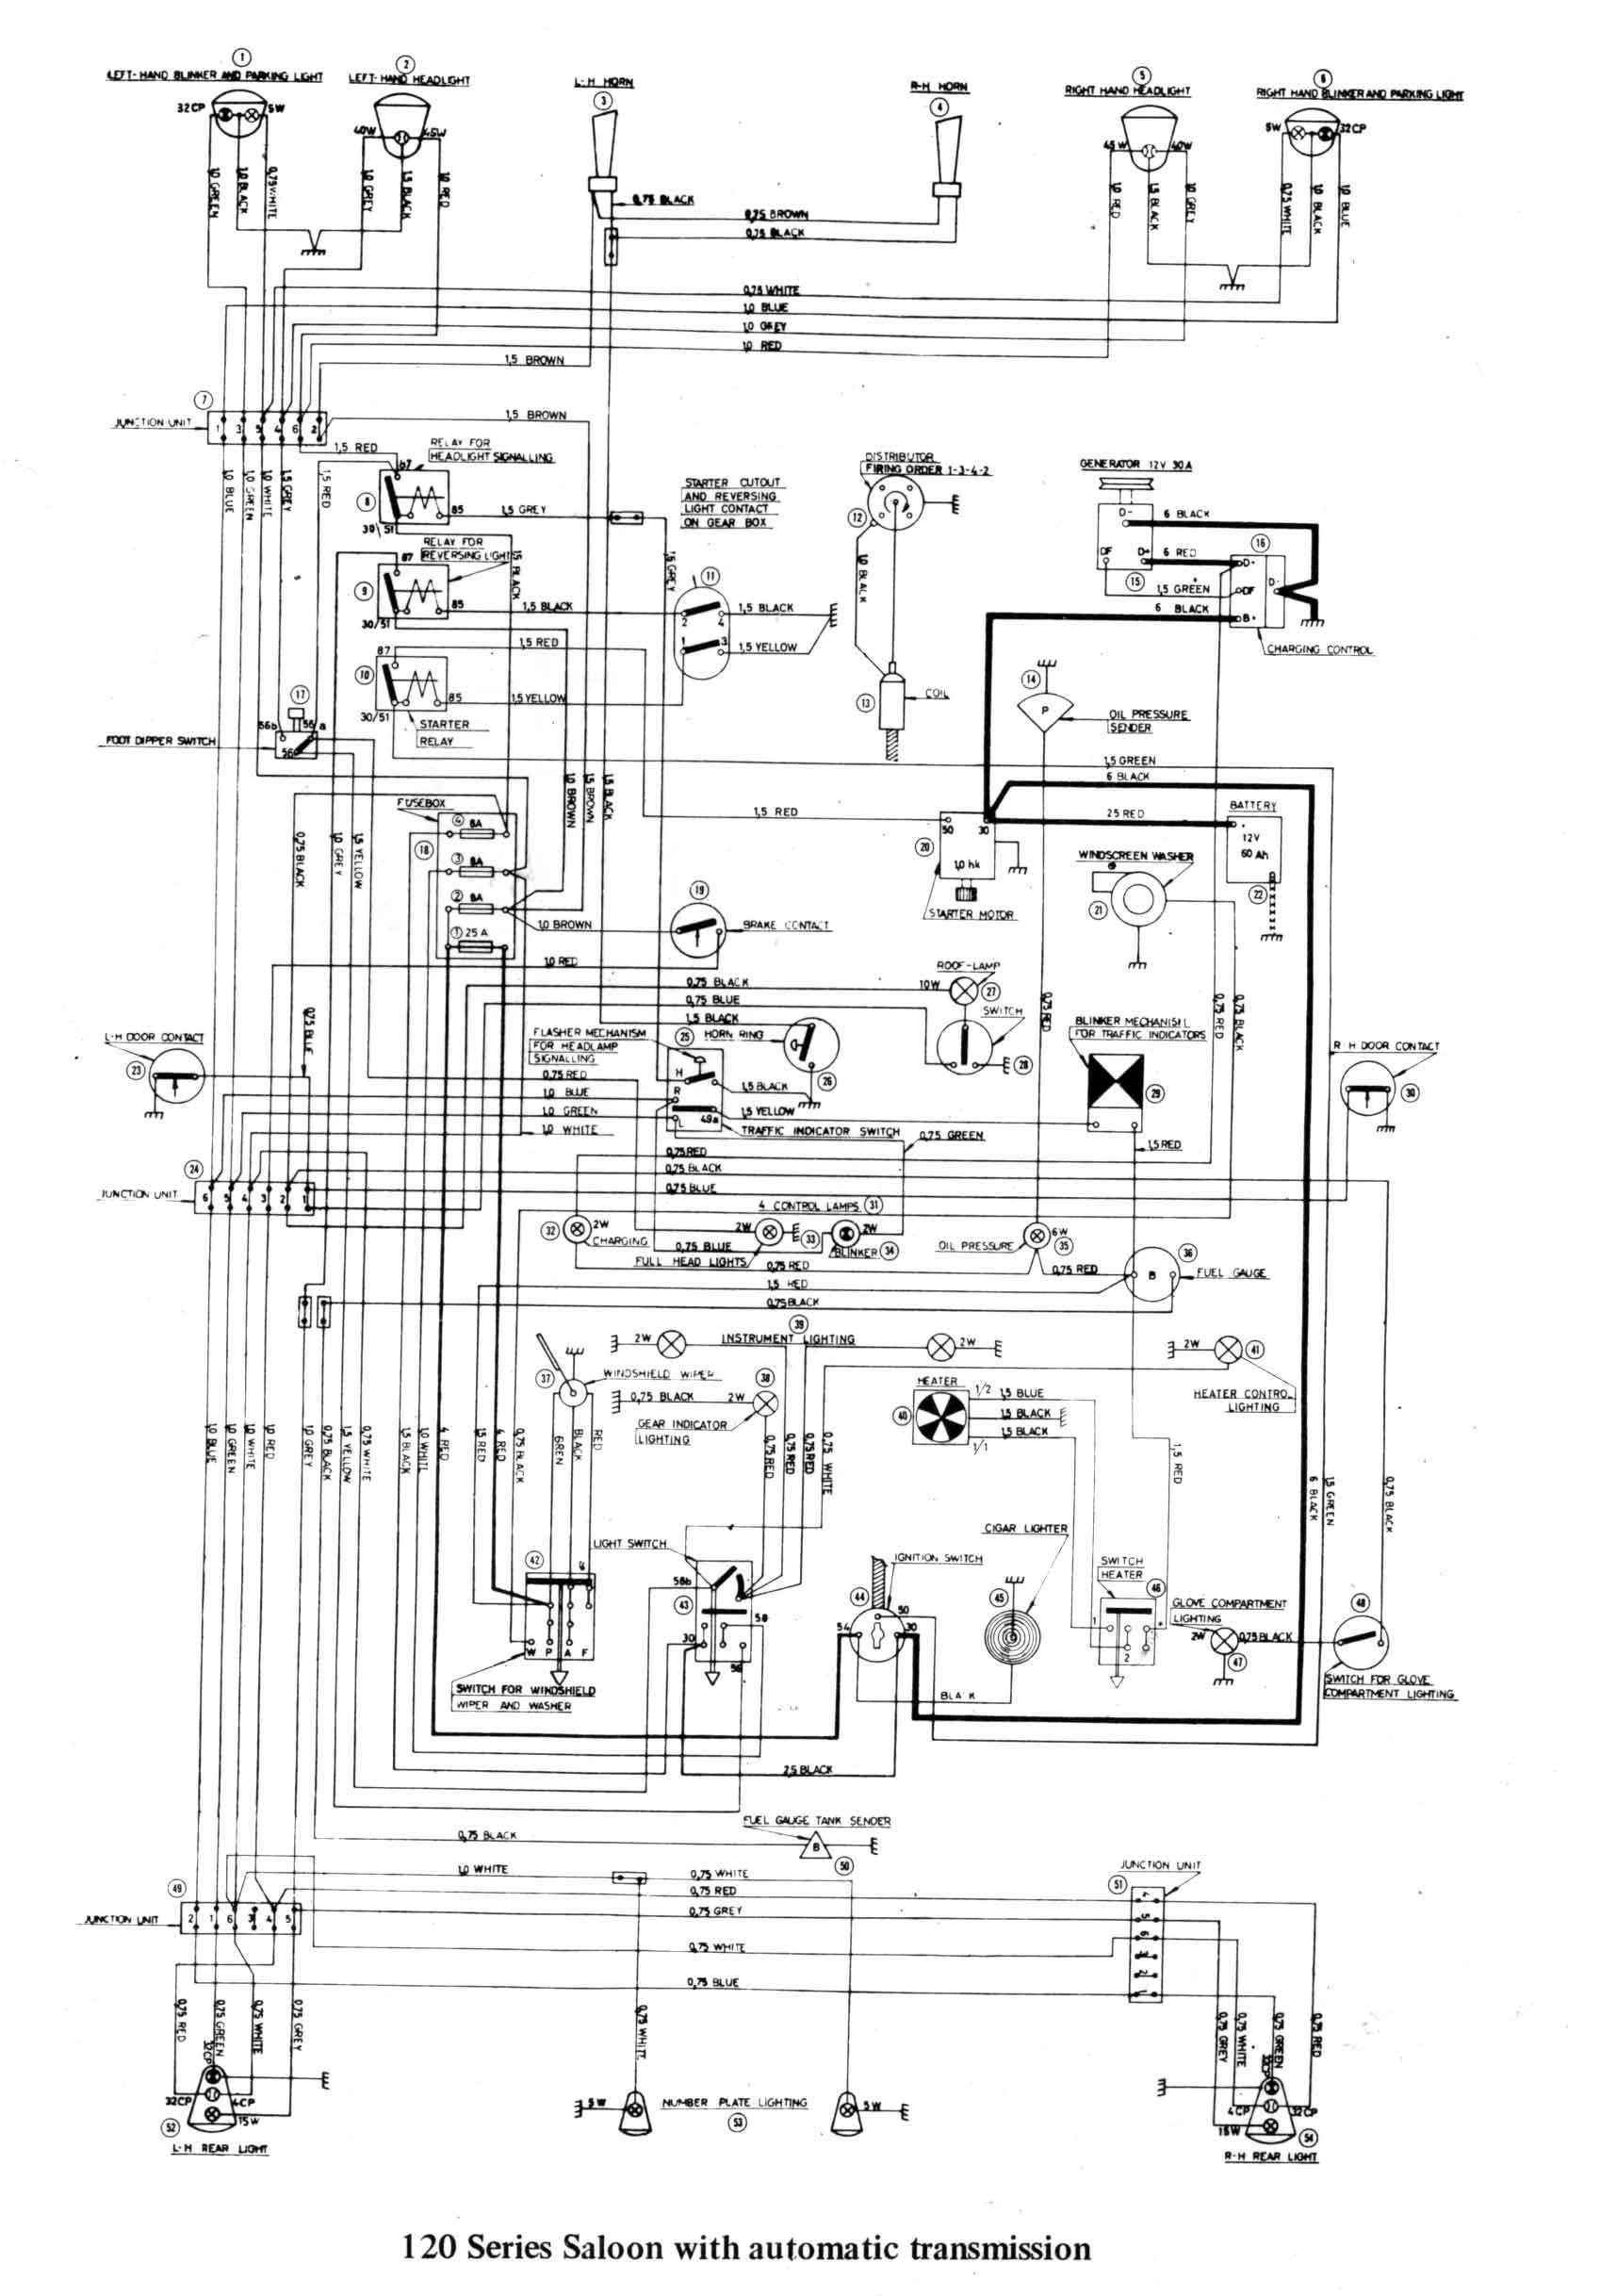 Power Wheels 12v Wiring Diagram - Wiring Diagram